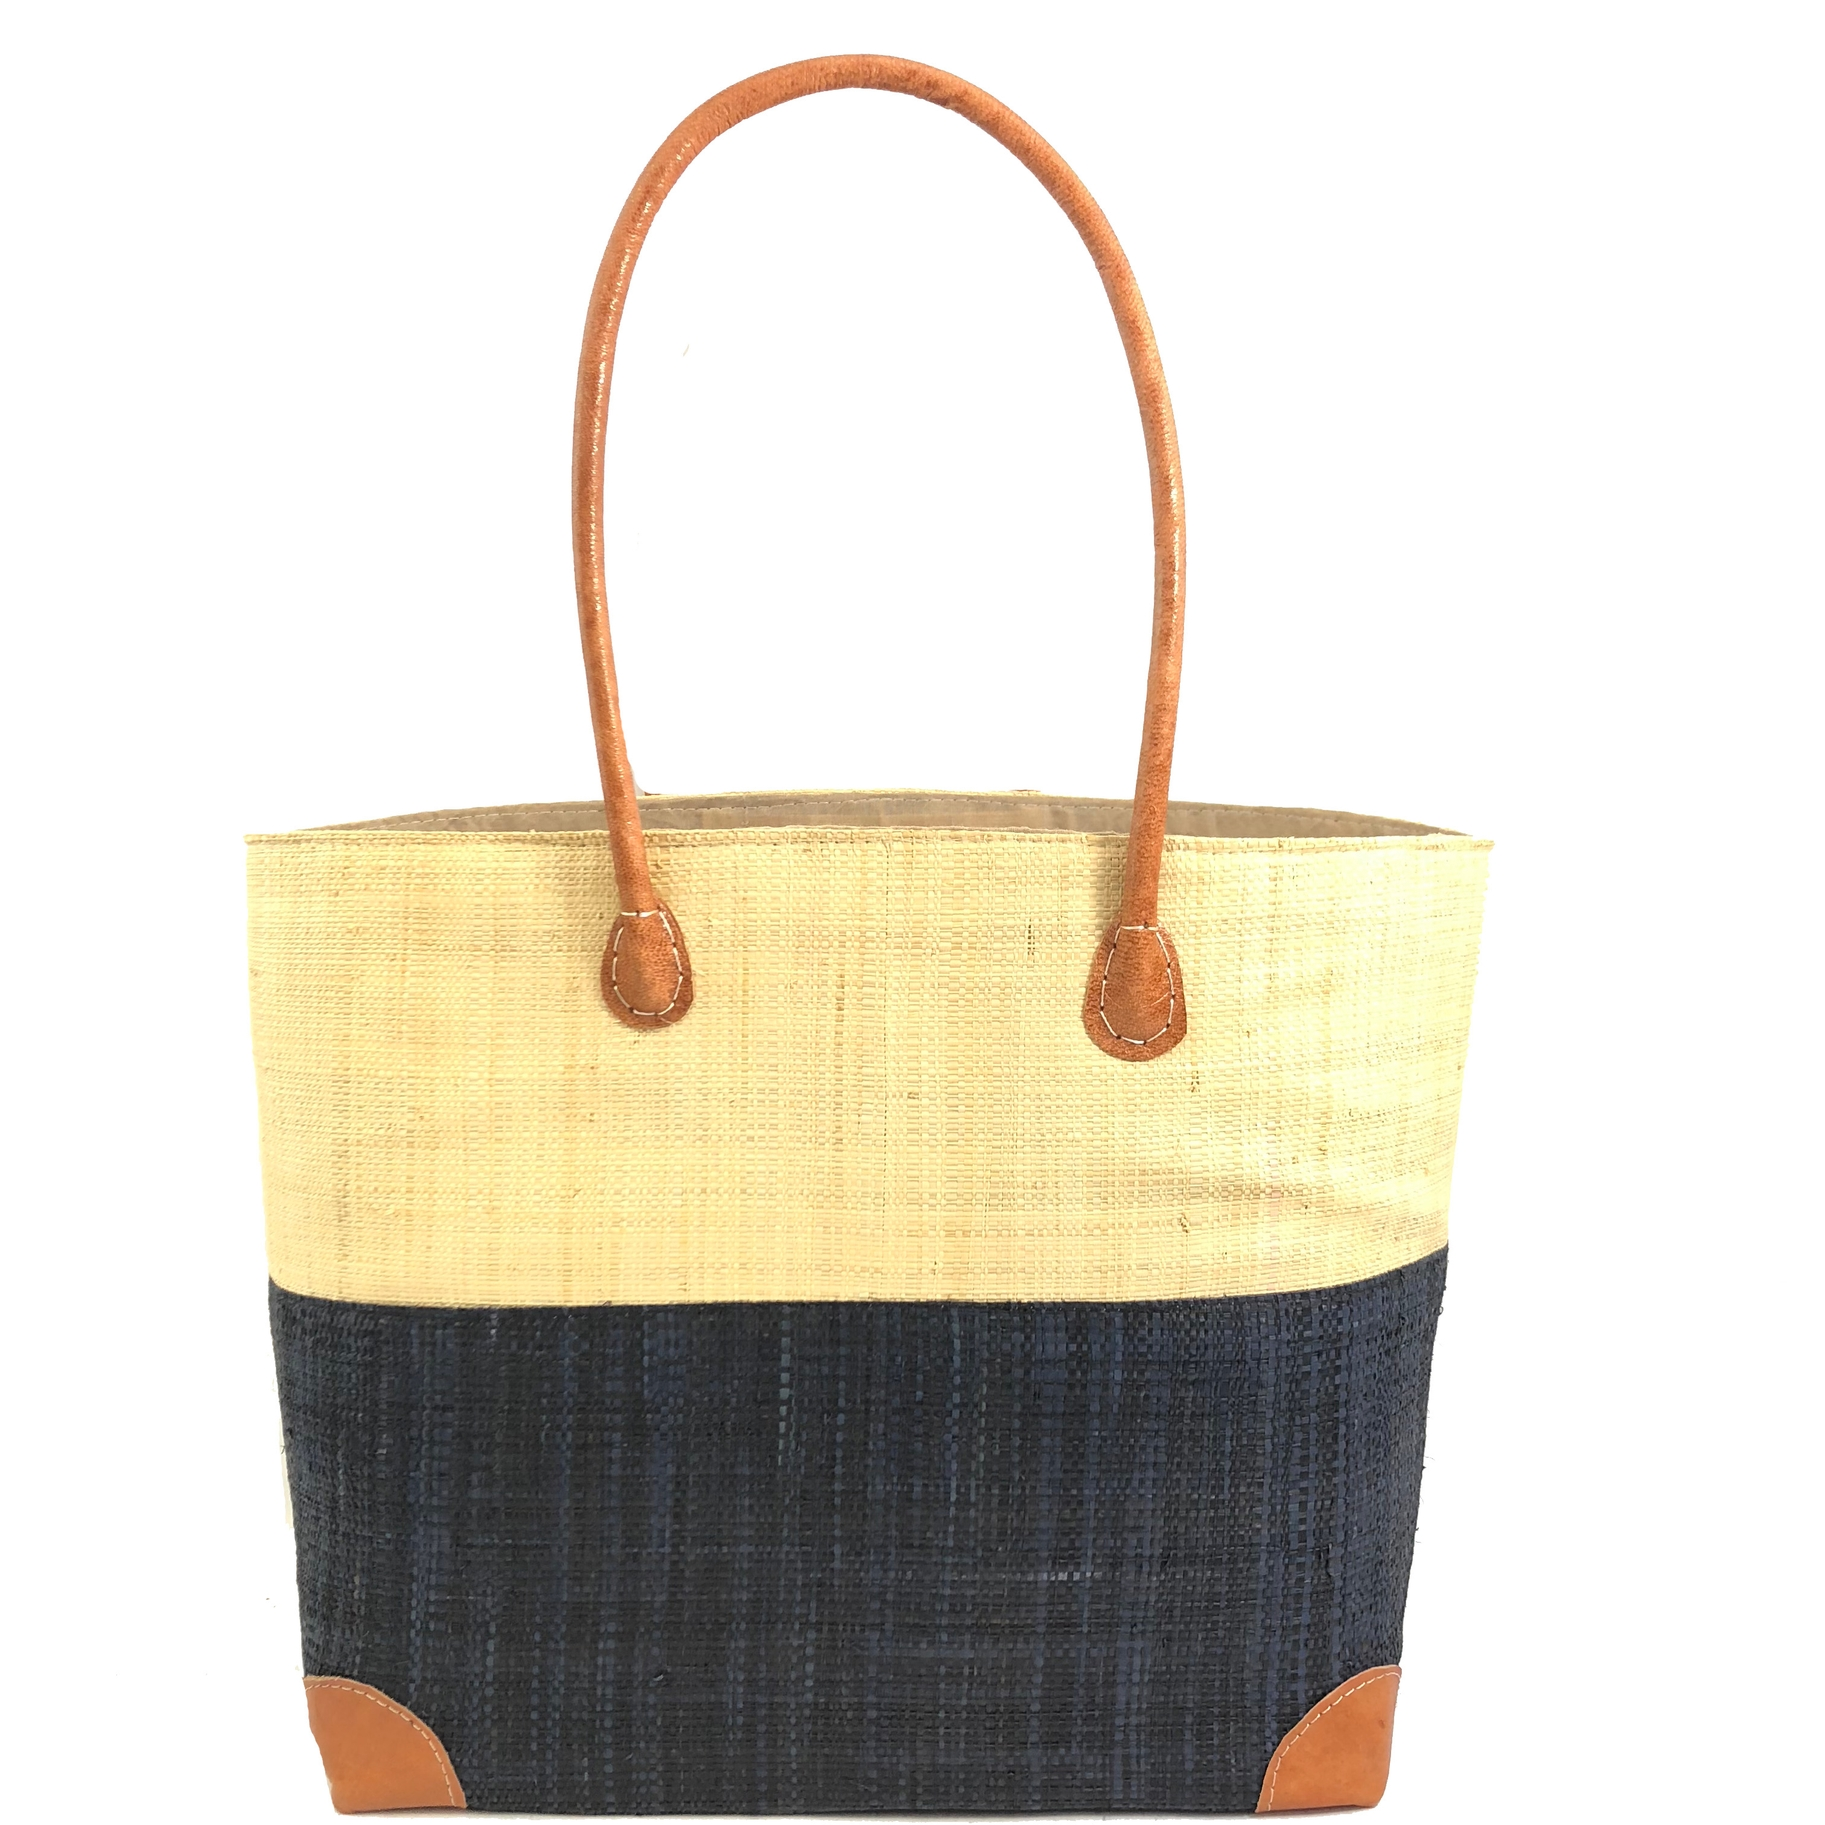 Trinidad Two Tone Straw Basket - Black | Trada Marketplace